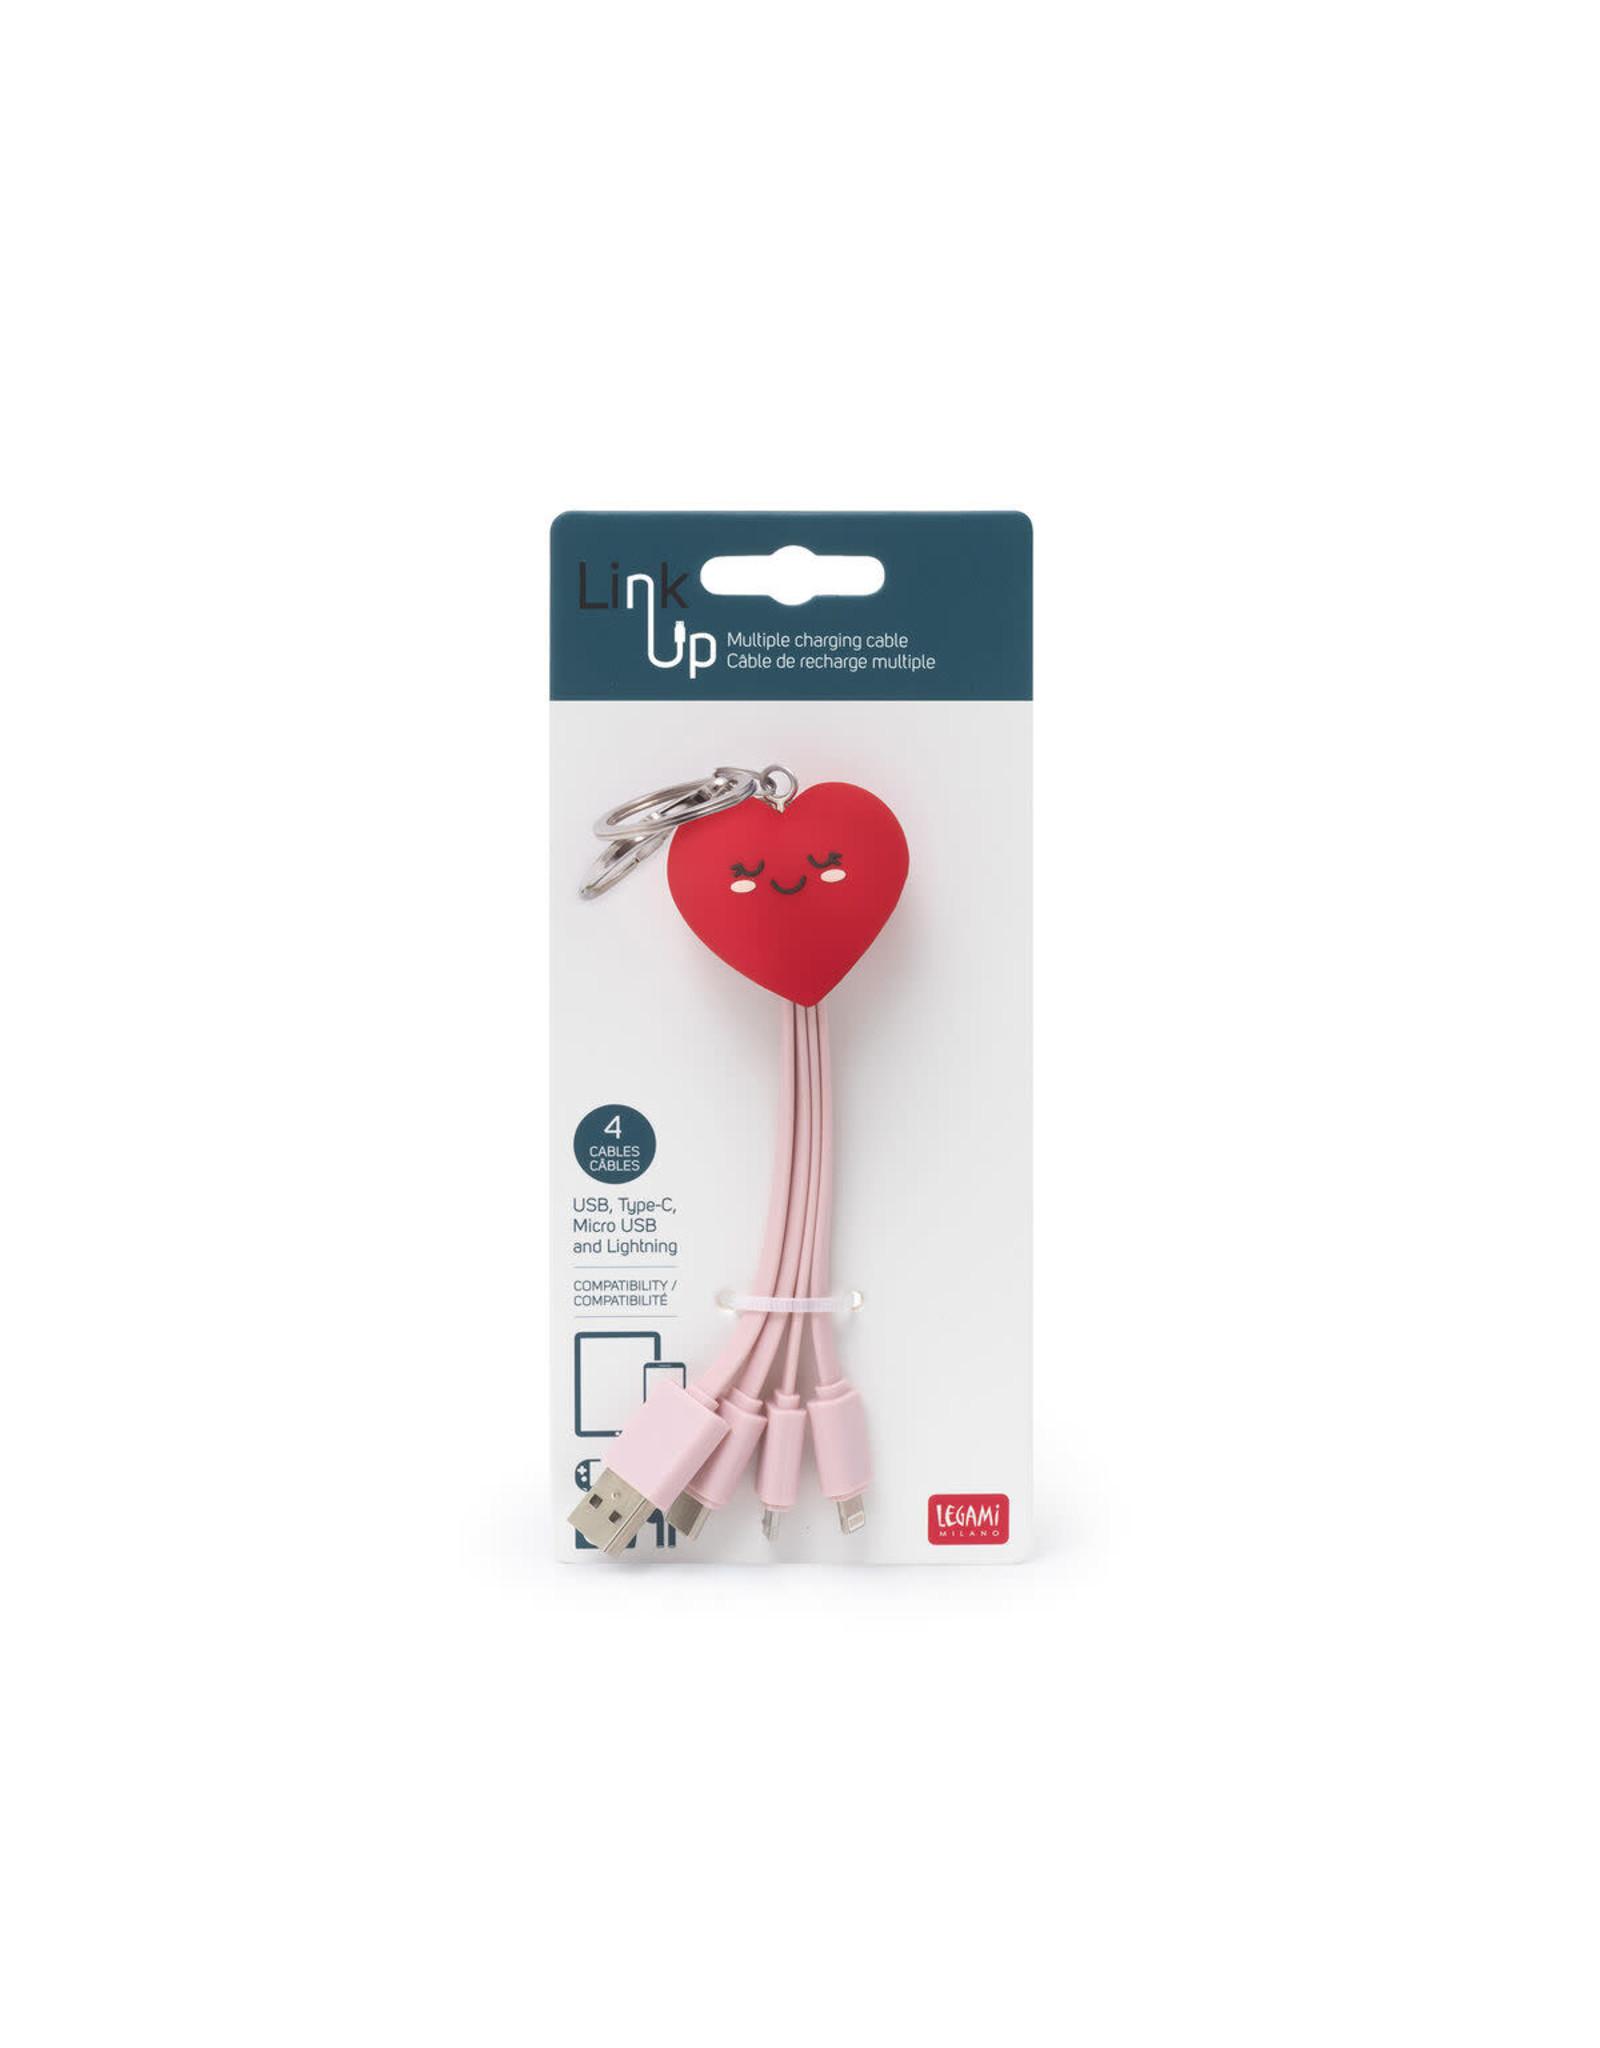 Legami charging cables - heart